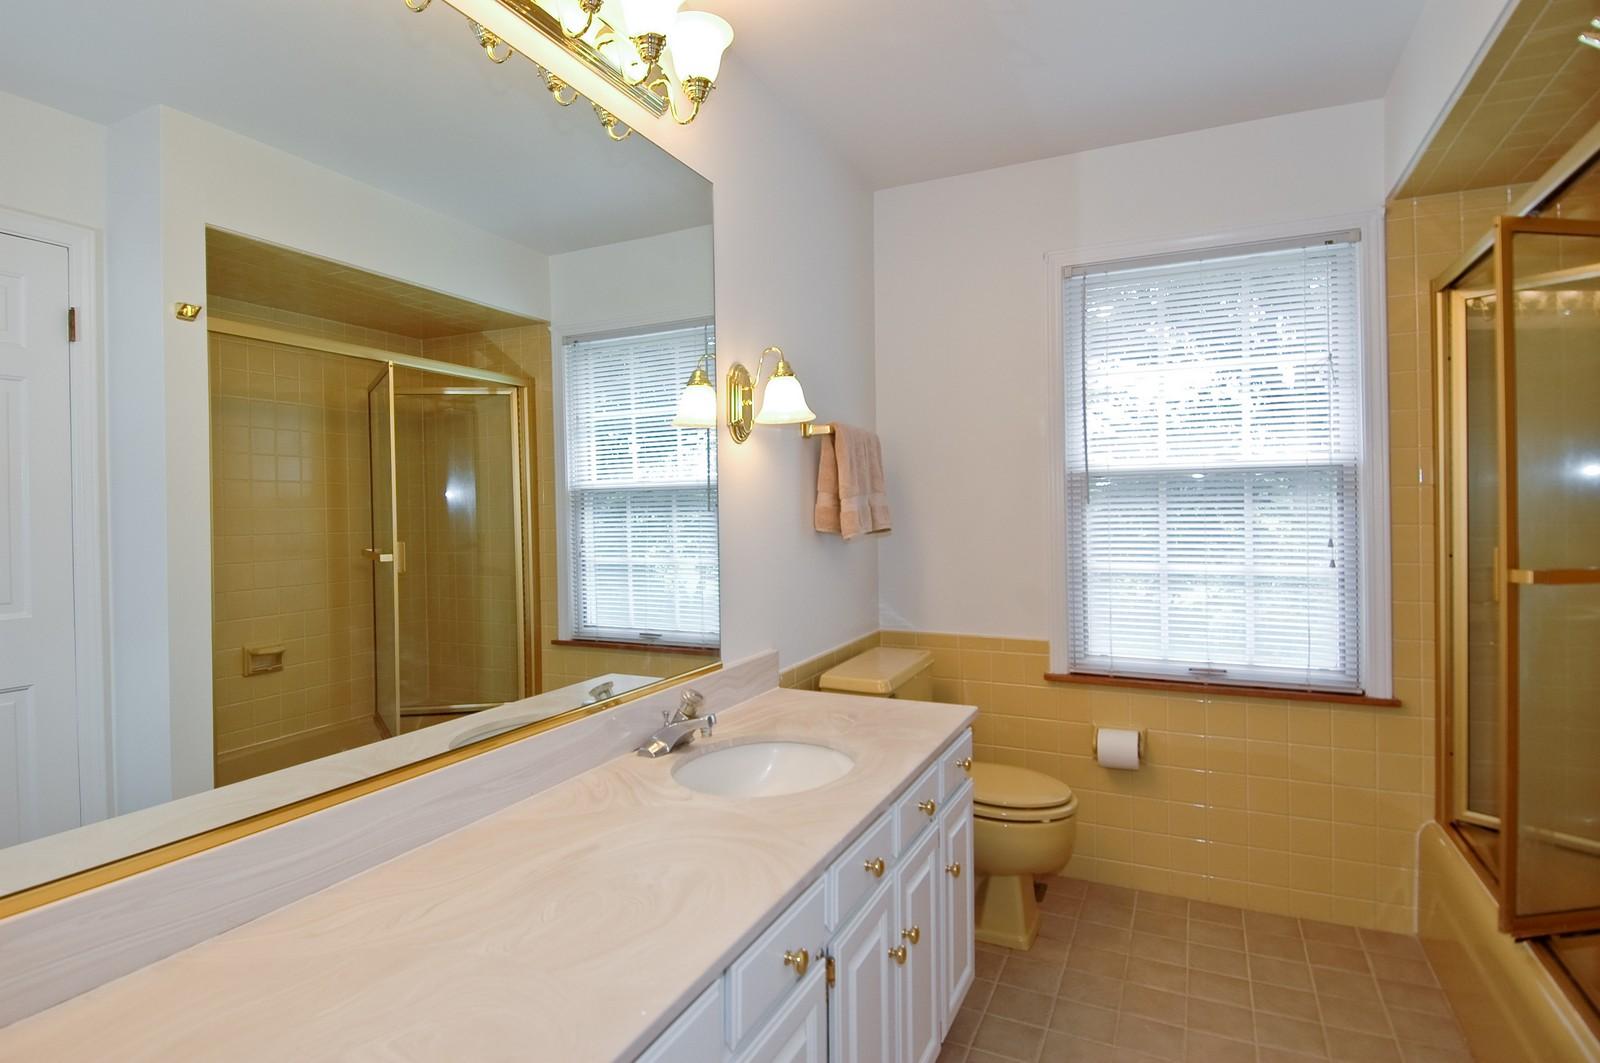 Real Estate Photography - 2785 Chapel, Barrington Hills, IL, 60010 - Bathroom